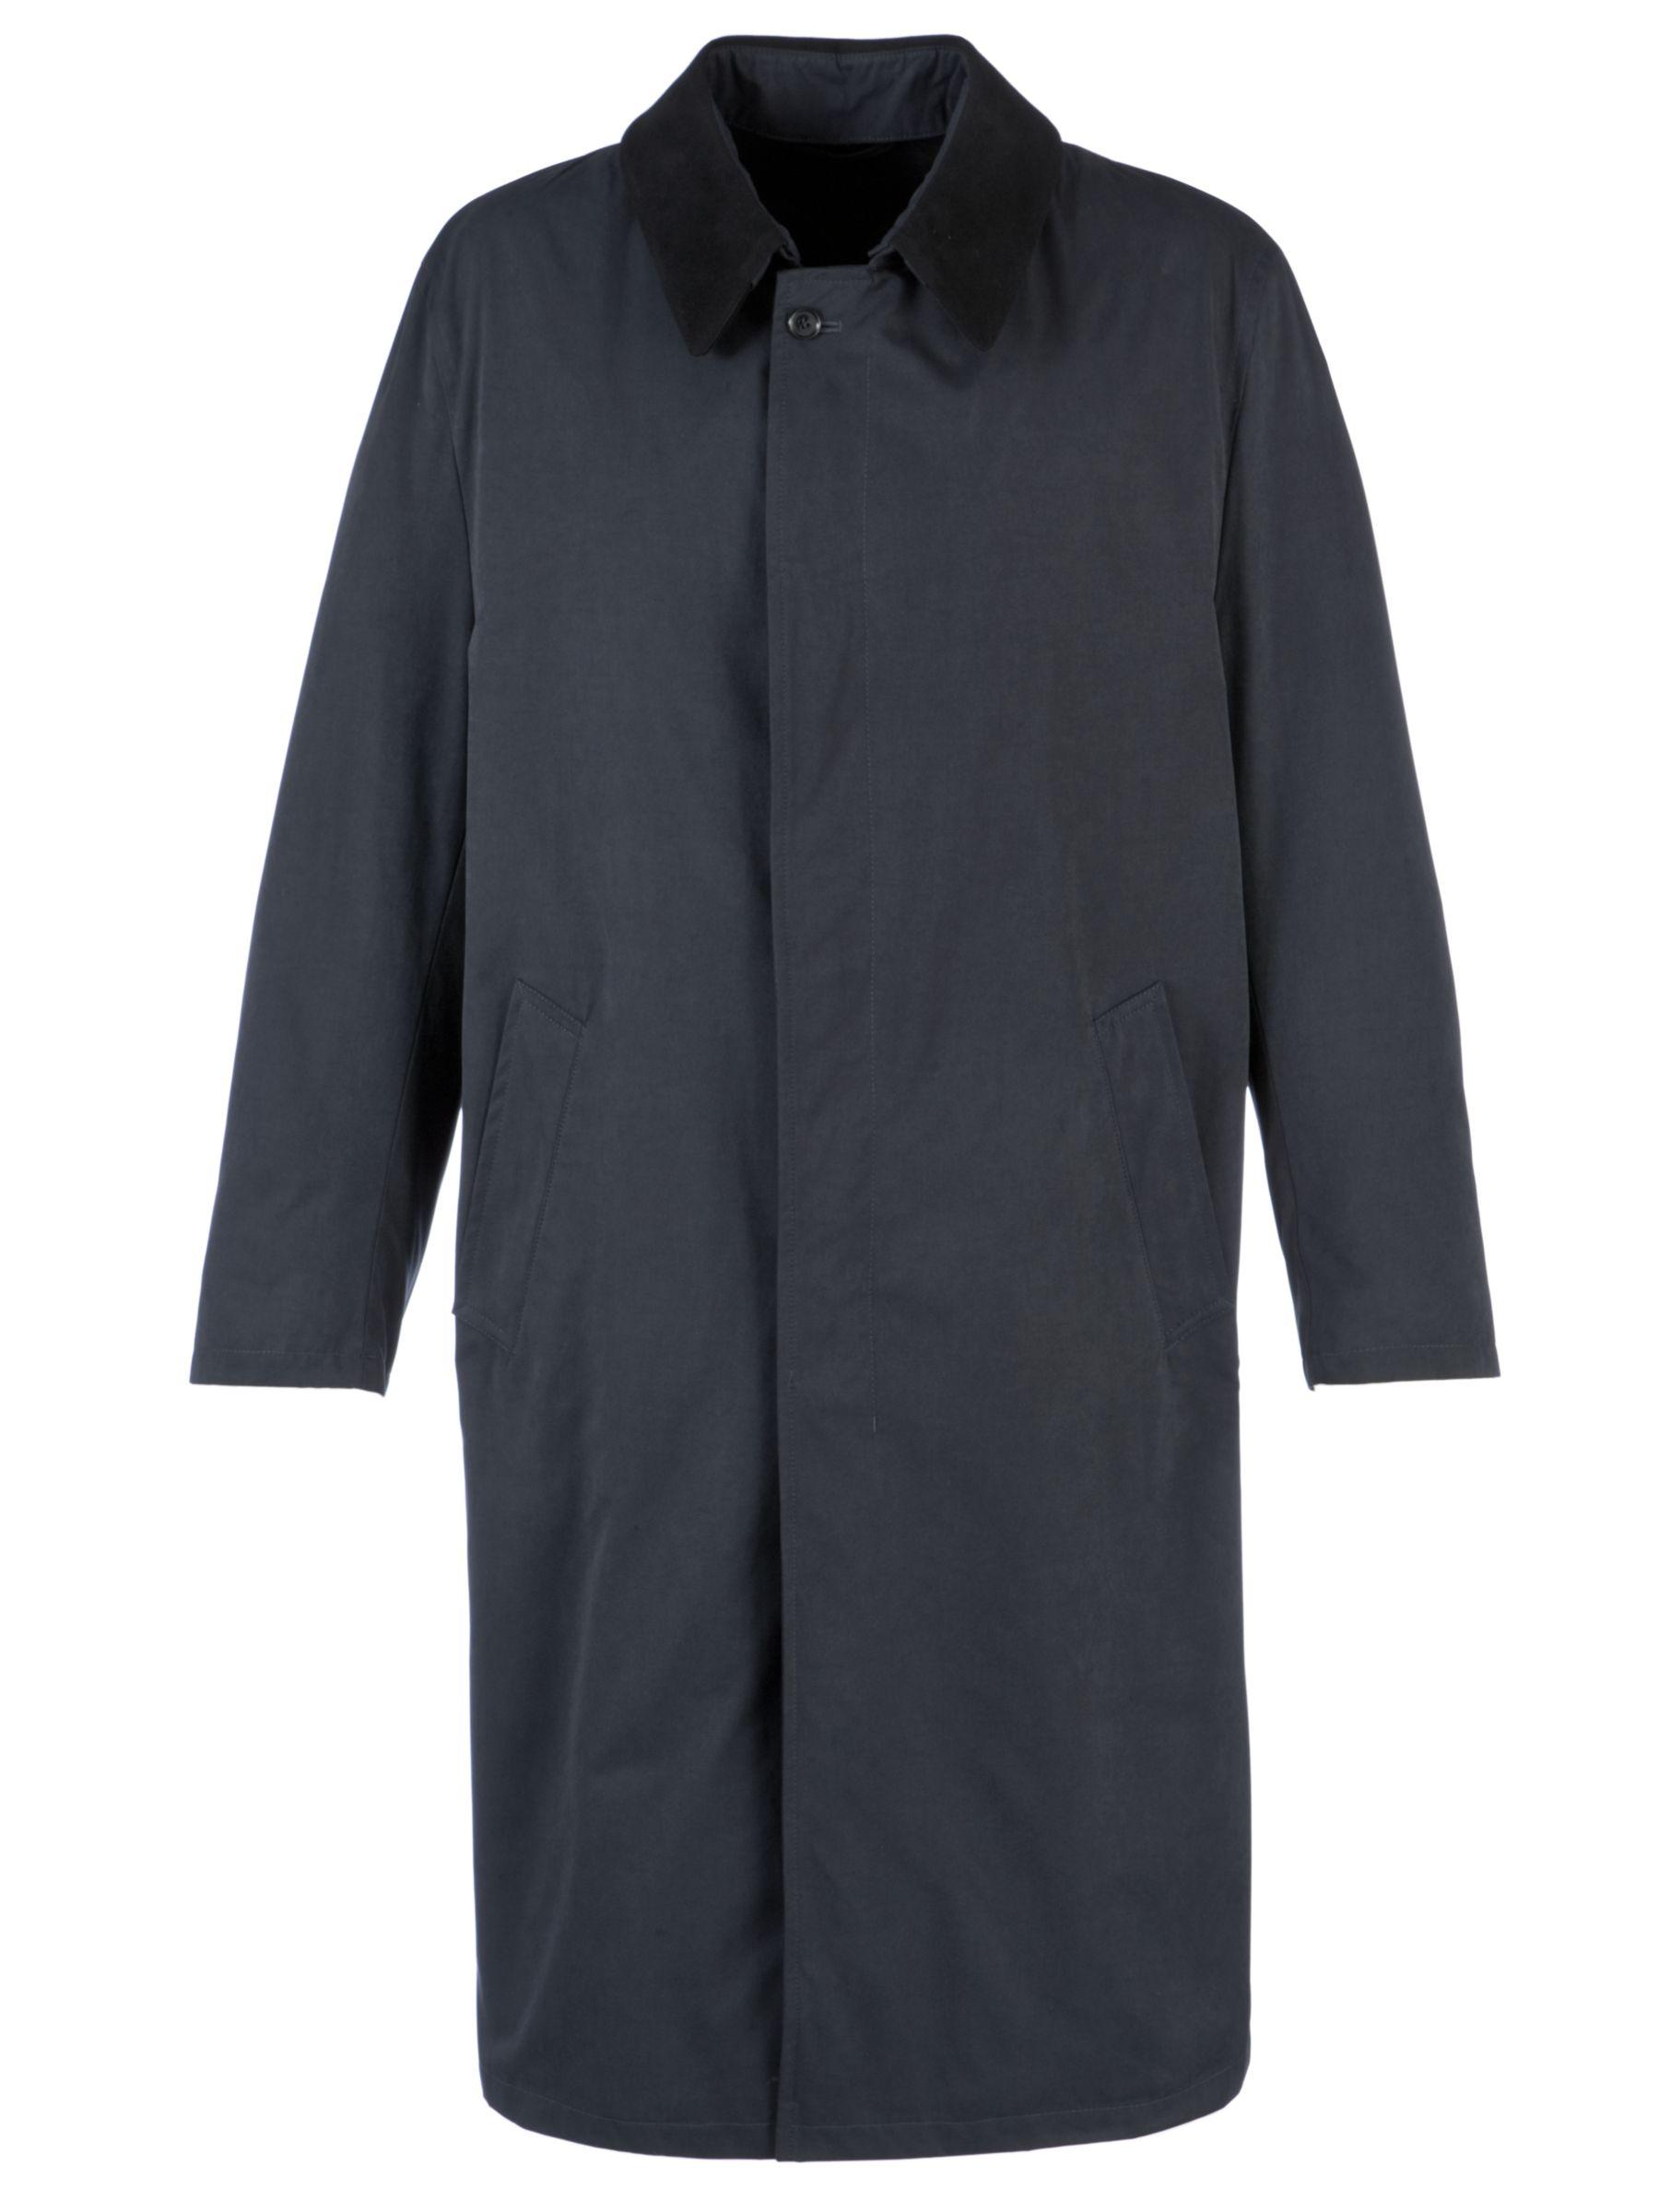 Bugatti Detachable Lining Raincoat, Black at John Lewis